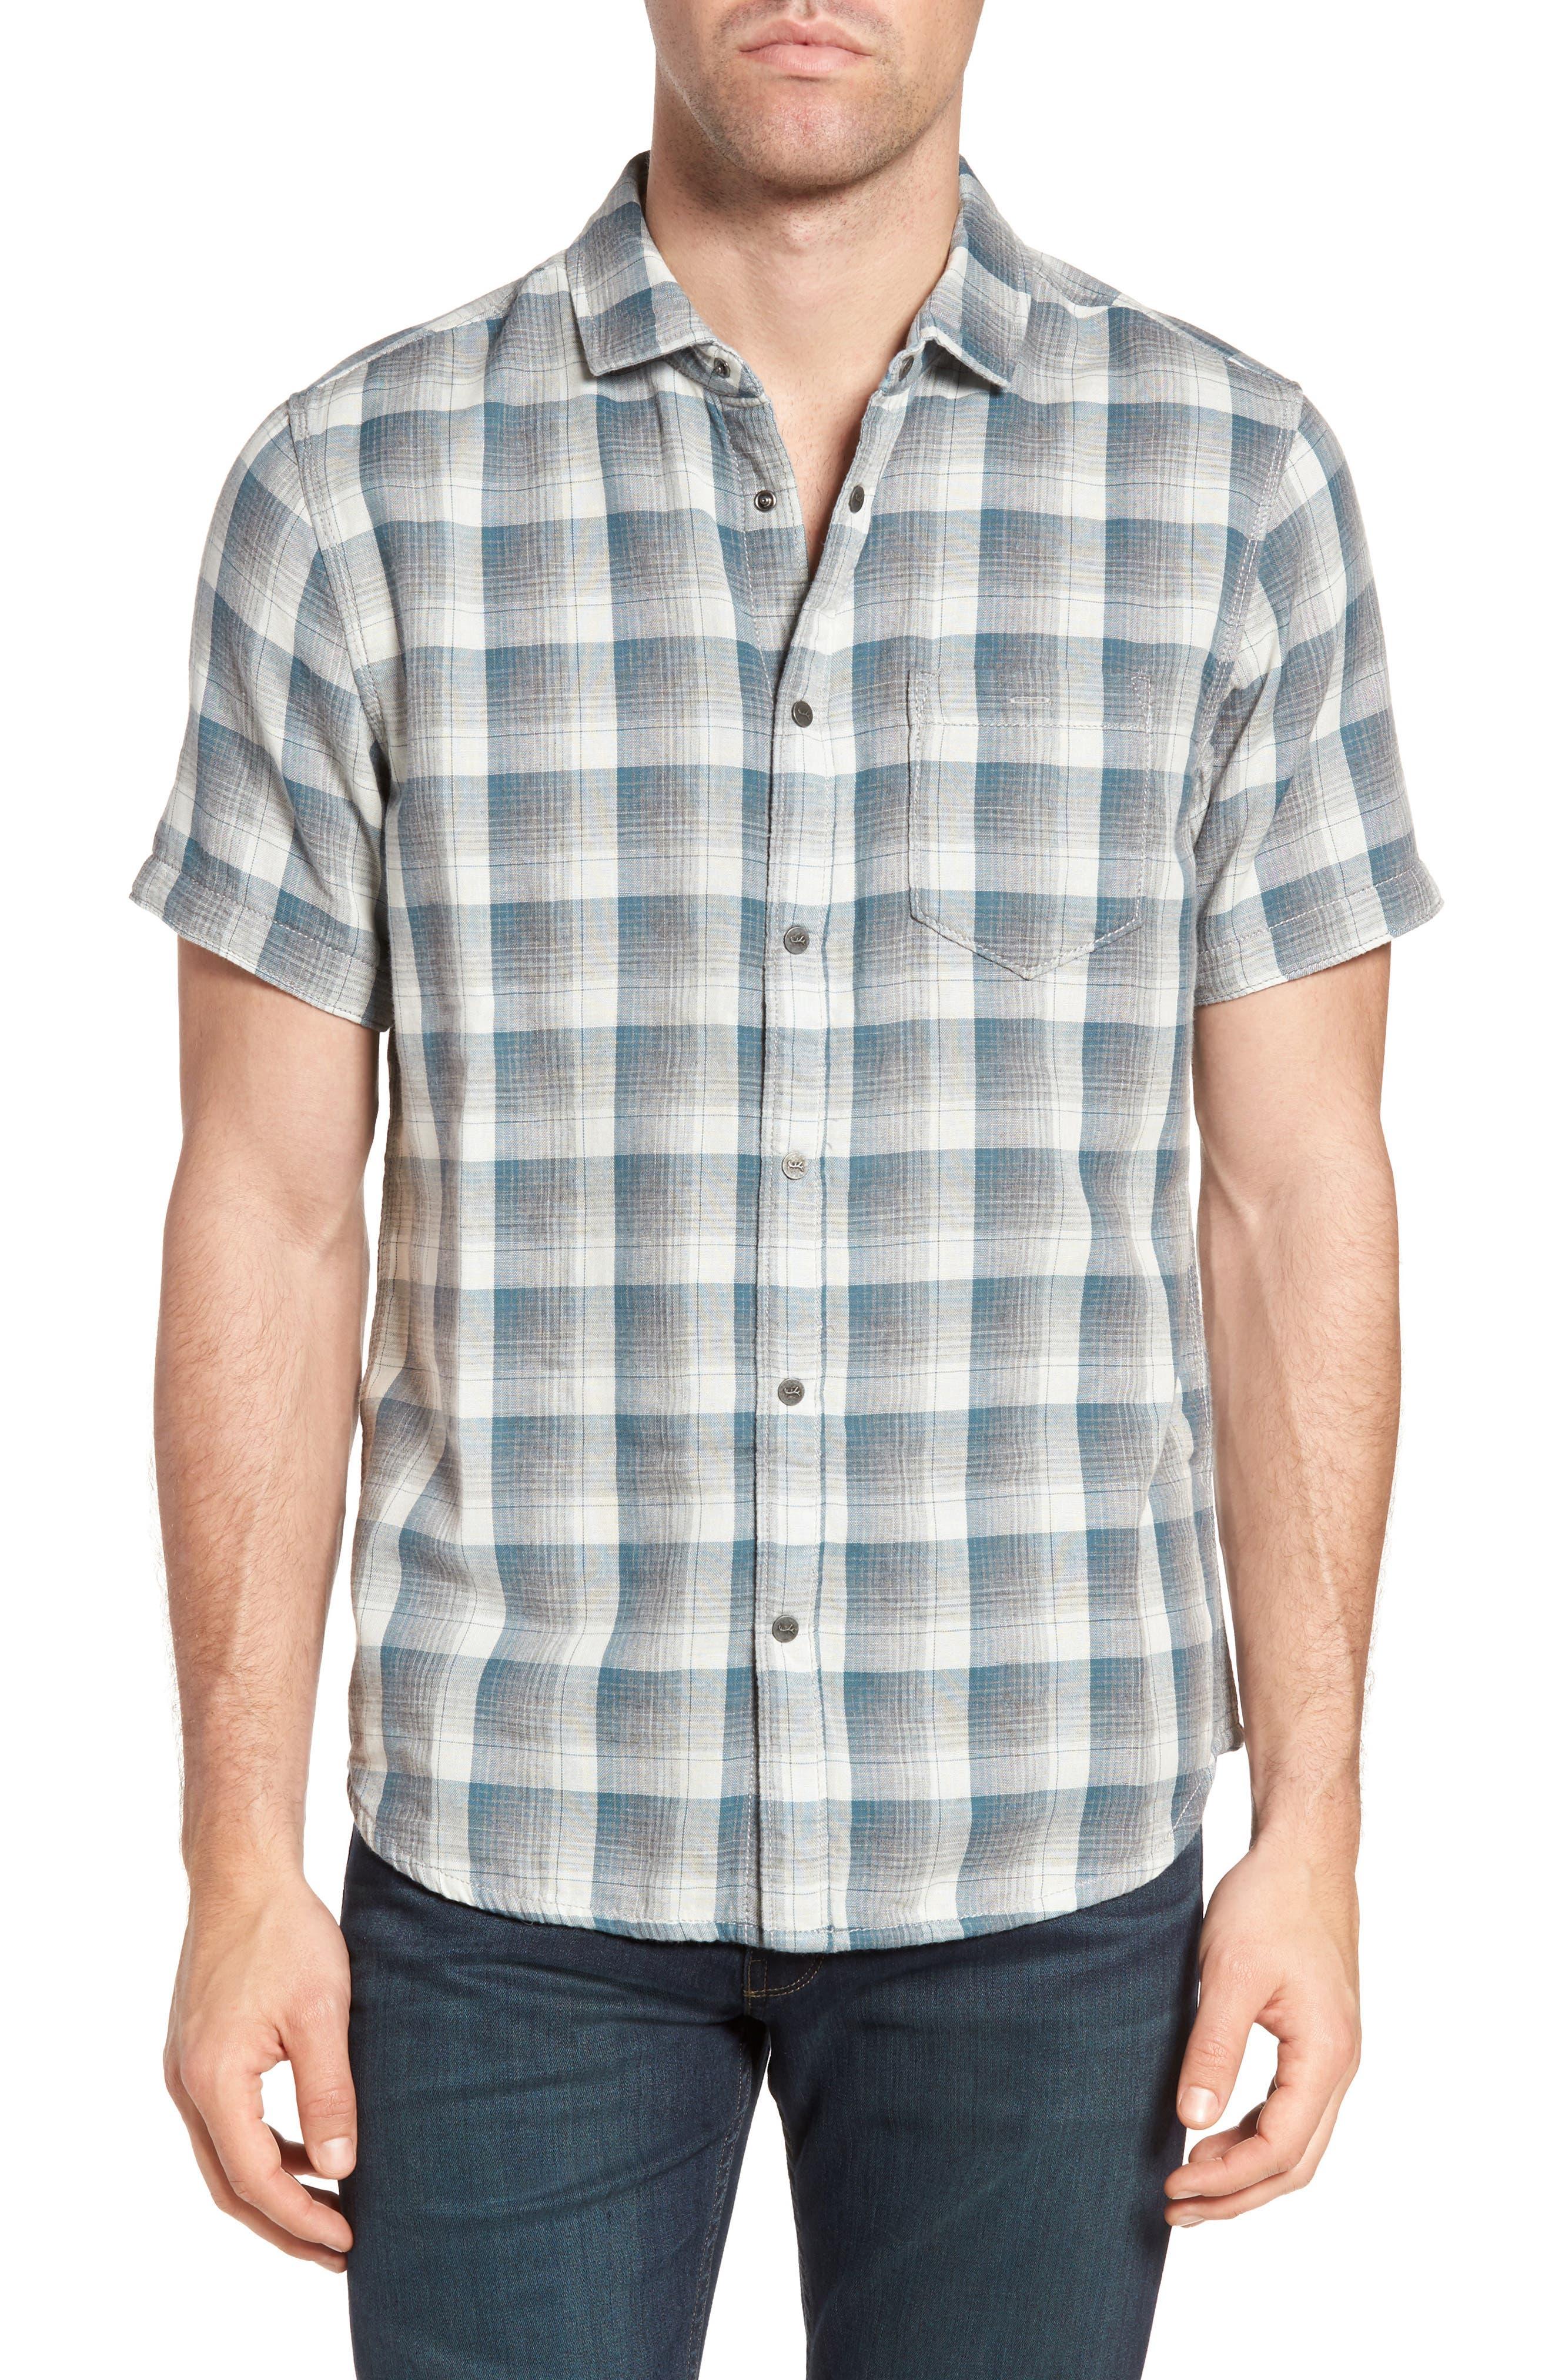 Jeremiah Clark Regular Fit Reversible Plaid Sport Shirt